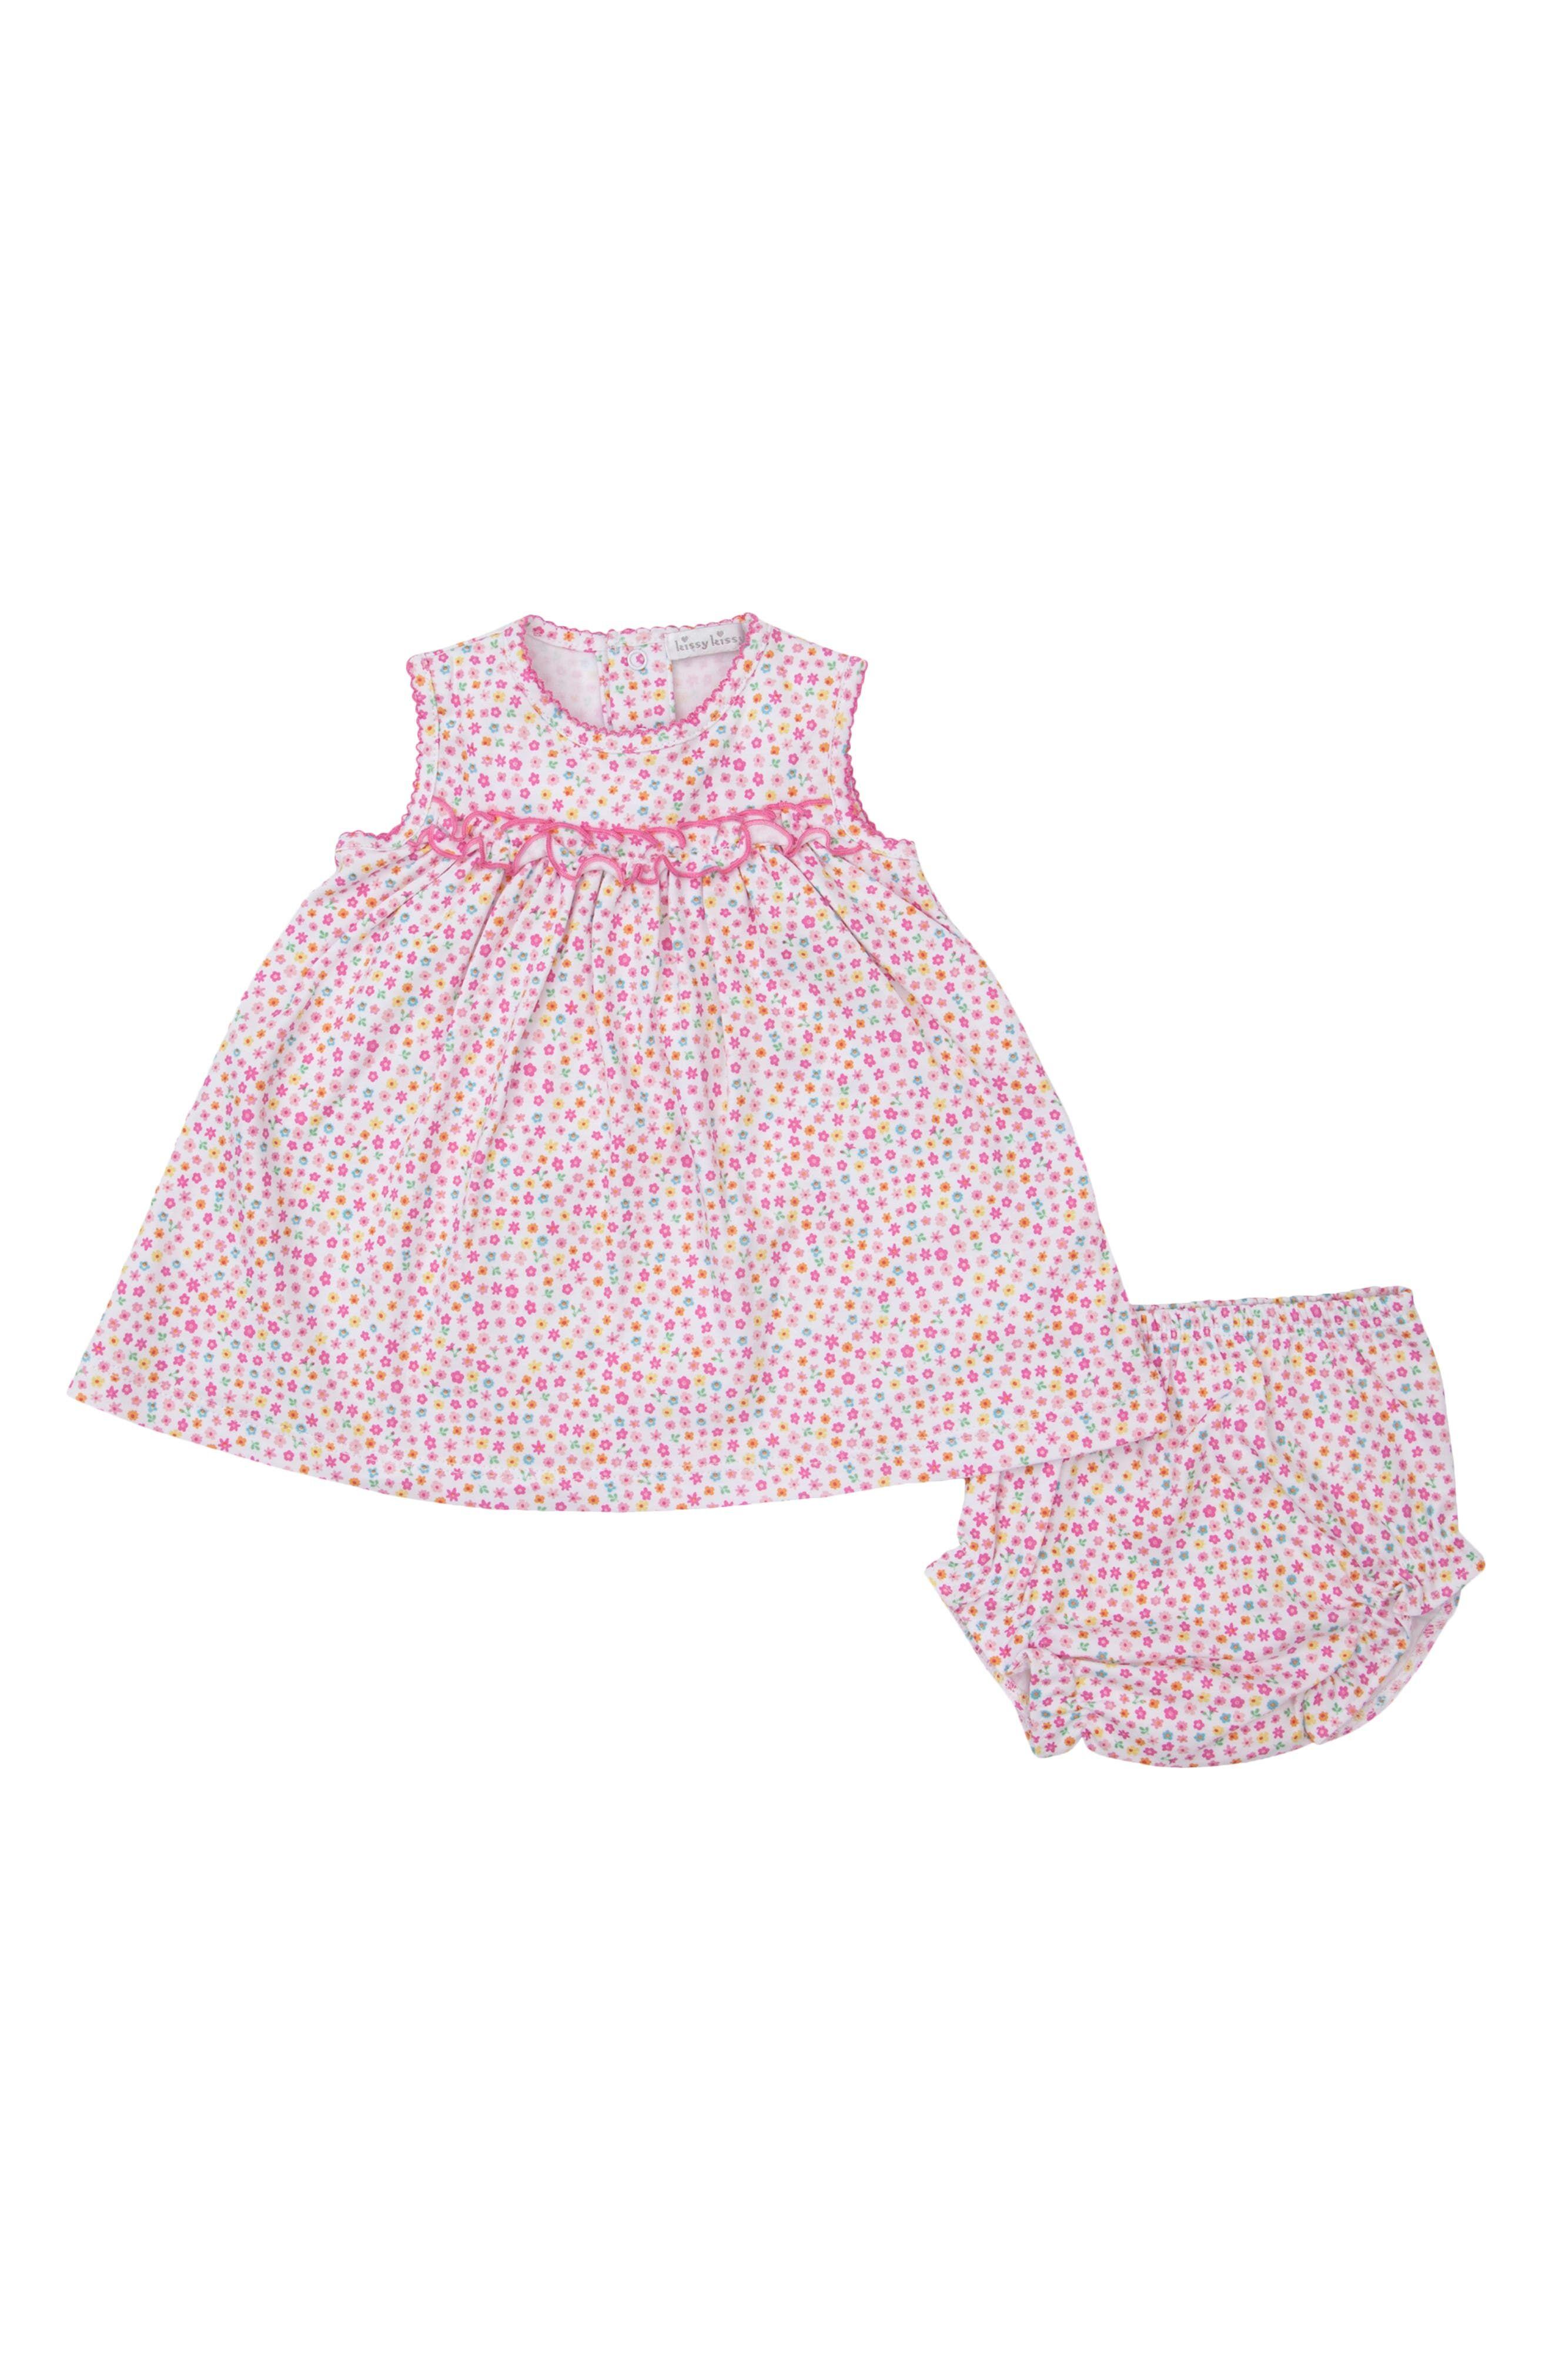 Kissy Kissy Infant Girl's Kissy Kissy Unicorn Gardens Print Dress, Size 12-18M - Pink